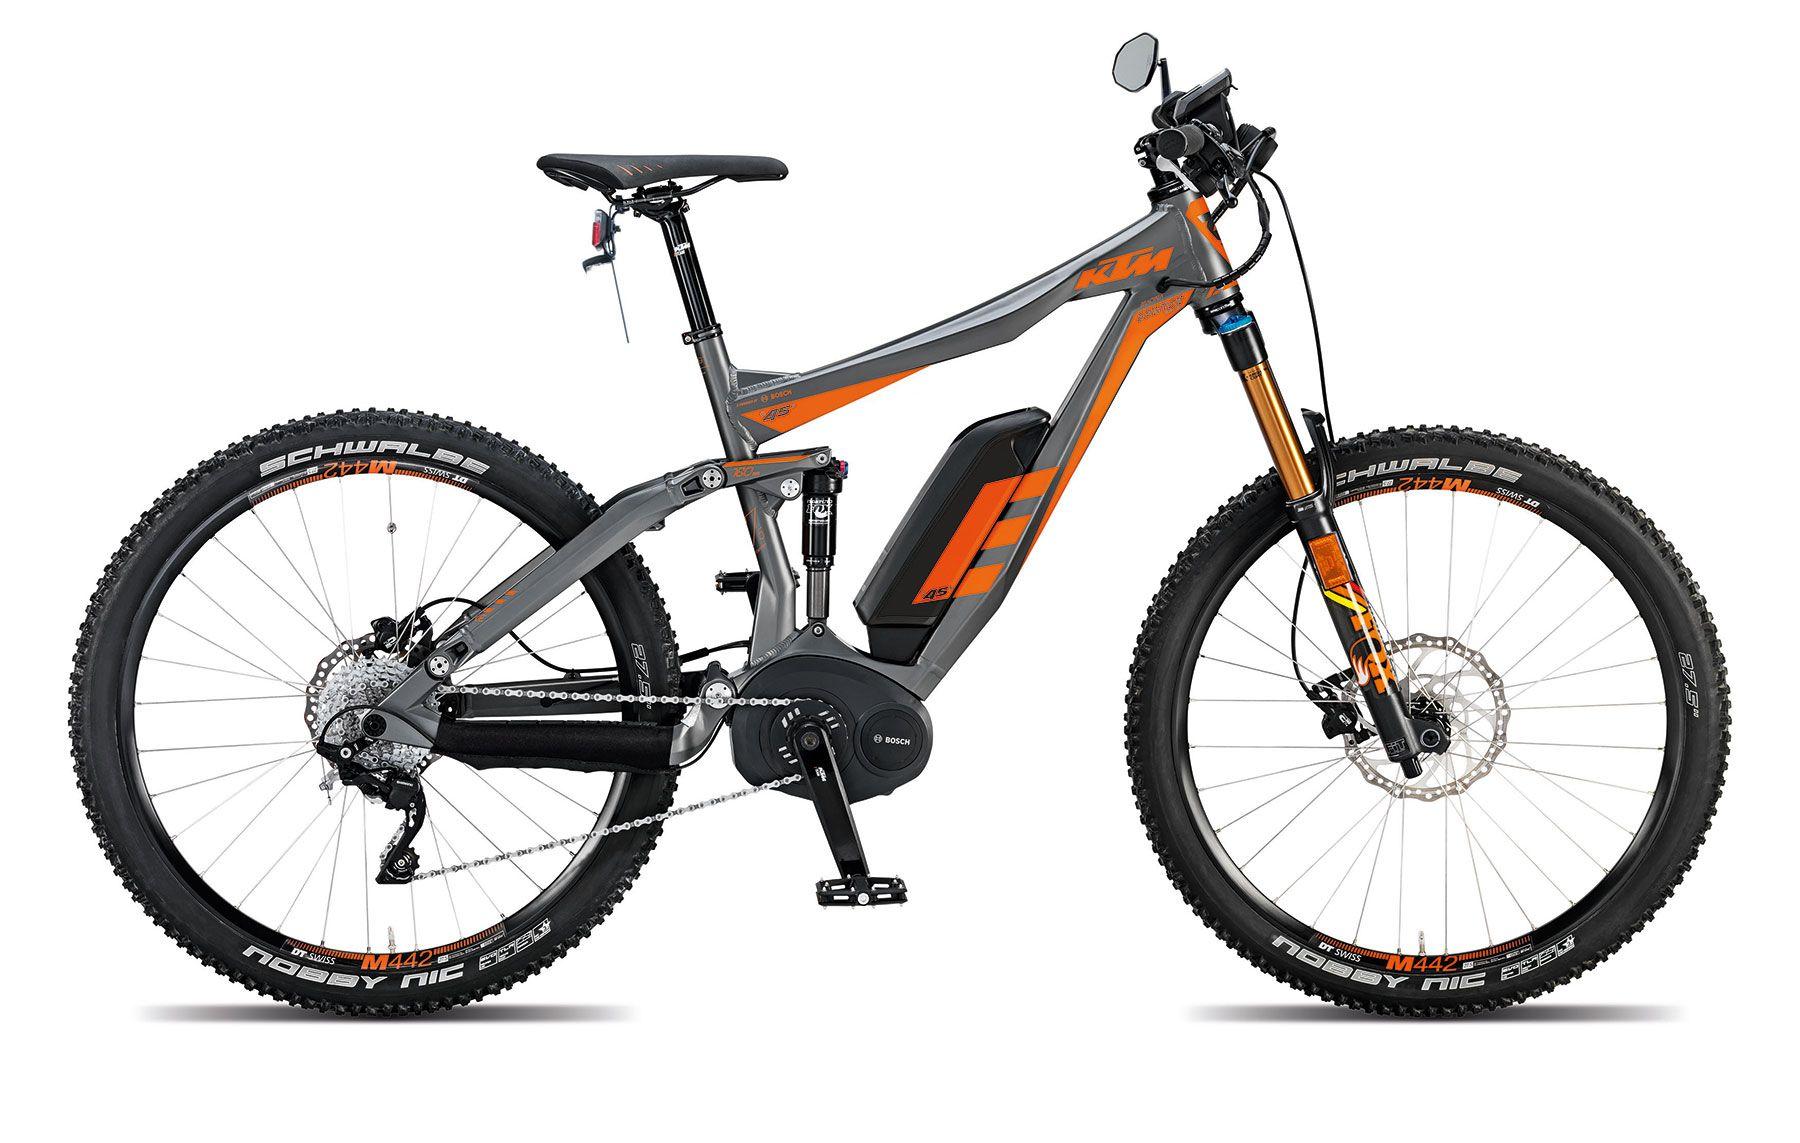 e bike ktm bike industries adventure bike pinterest. Black Bedroom Furniture Sets. Home Design Ideas